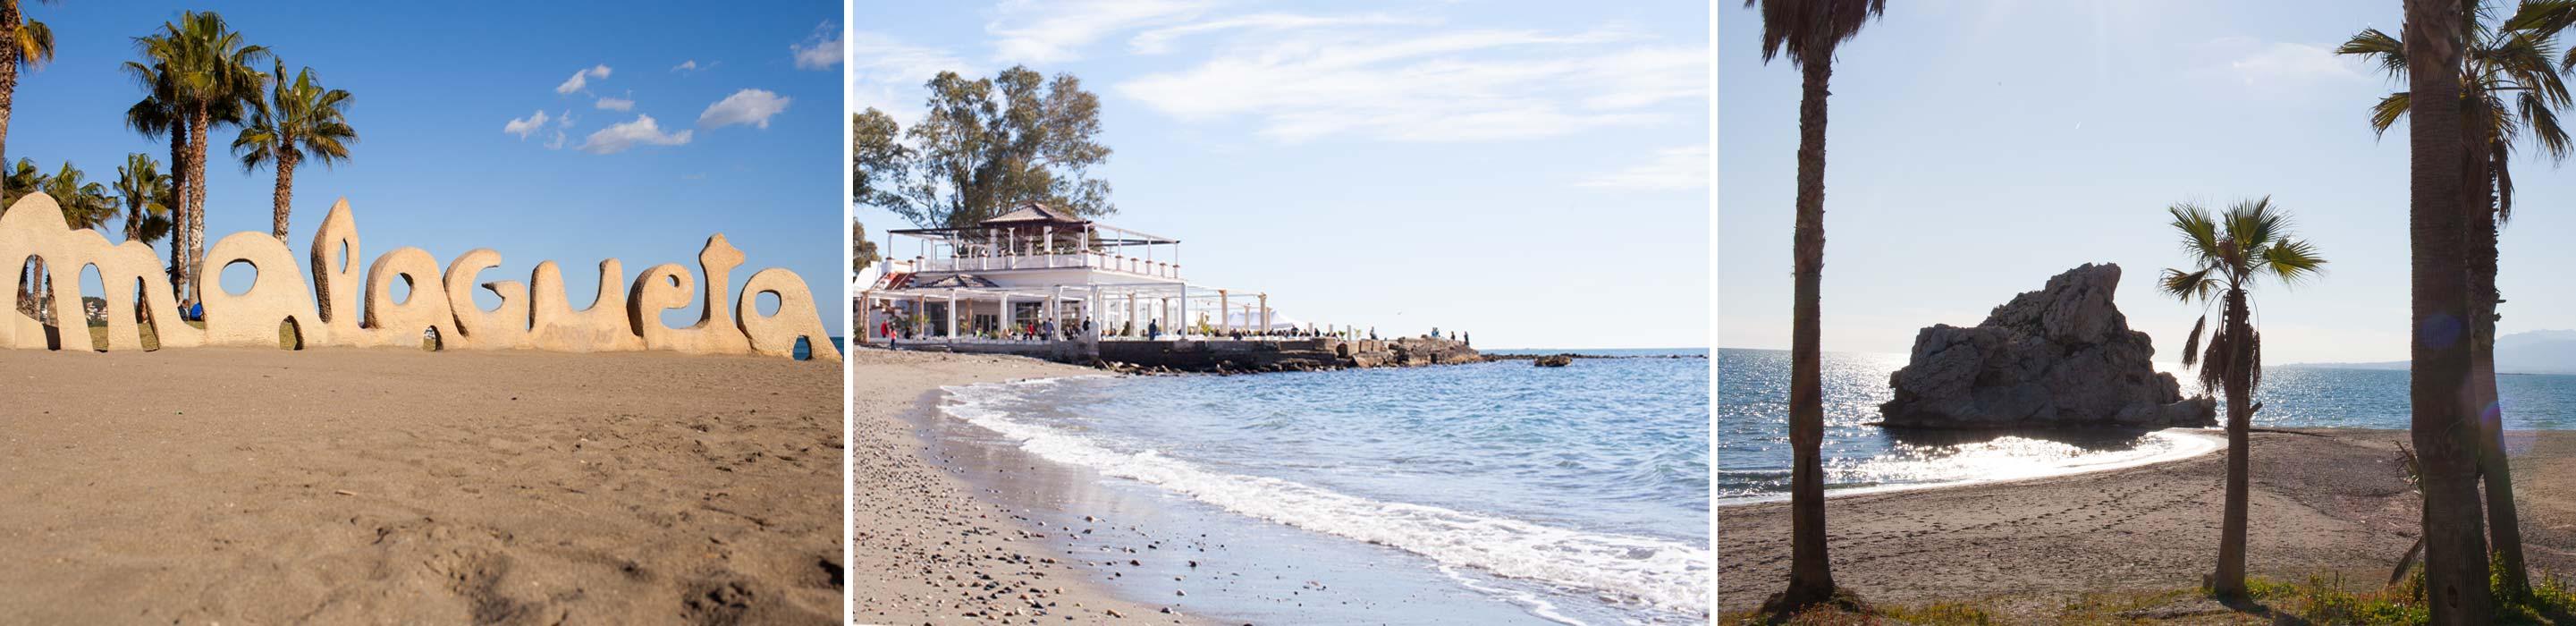 Fietsroute Malaga strand en kust